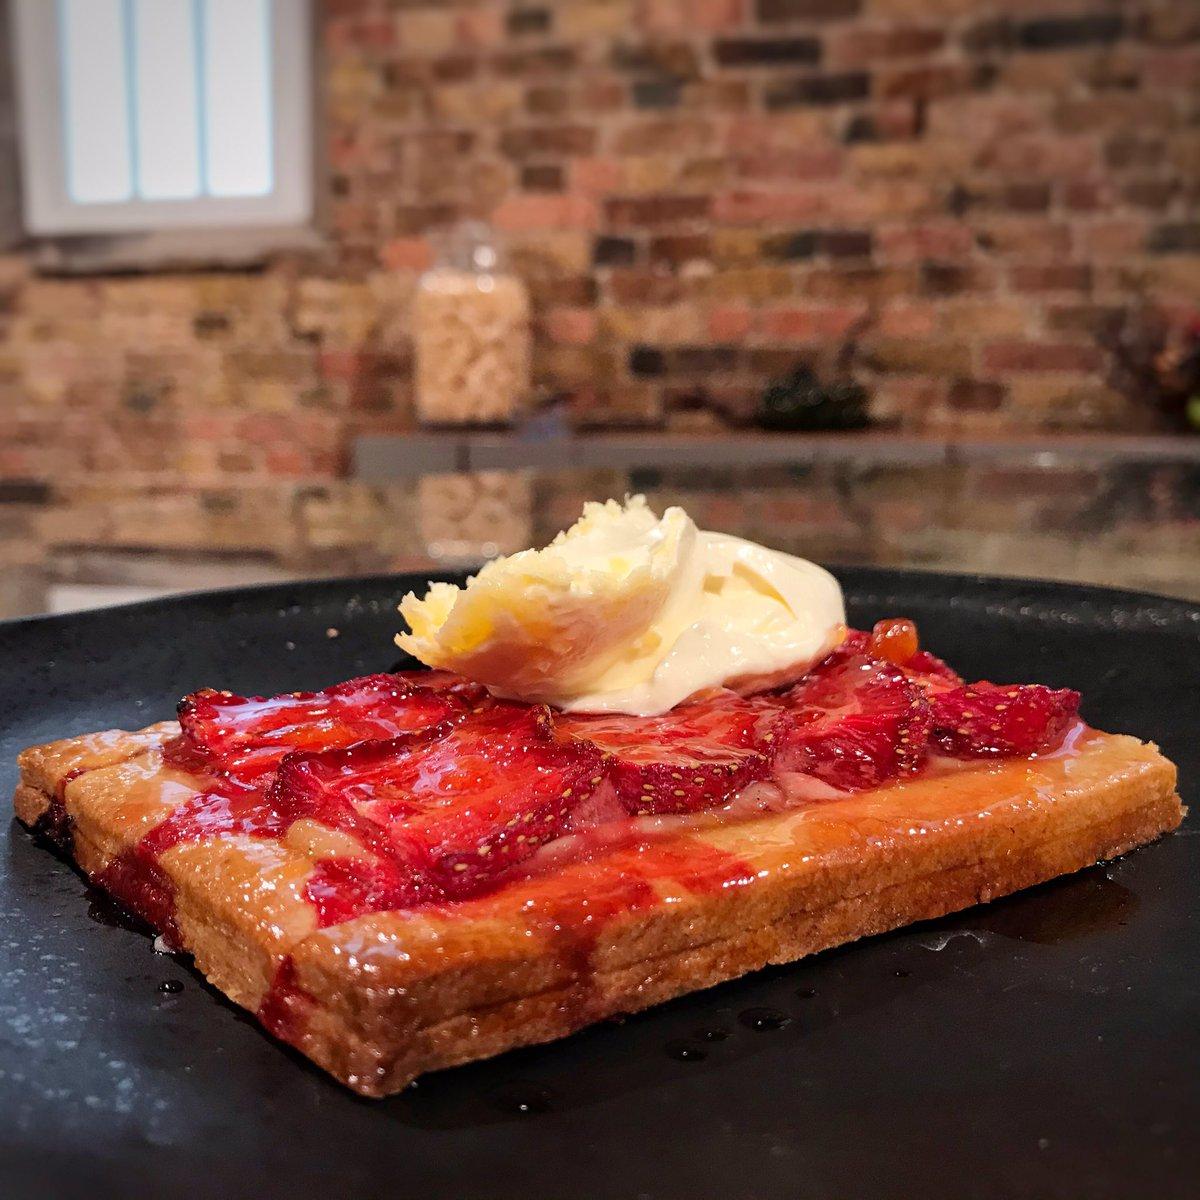 Matt's strawberry galette inspired by Wimbledon!🎾🍓  You can find the recipe here: https://t.co/SL4d5CVqOg  #SaturdayKitchen @matt_tebbutt @BBCFood @BBCOne #Wimbledon https://t.co/cE5RxKhdic